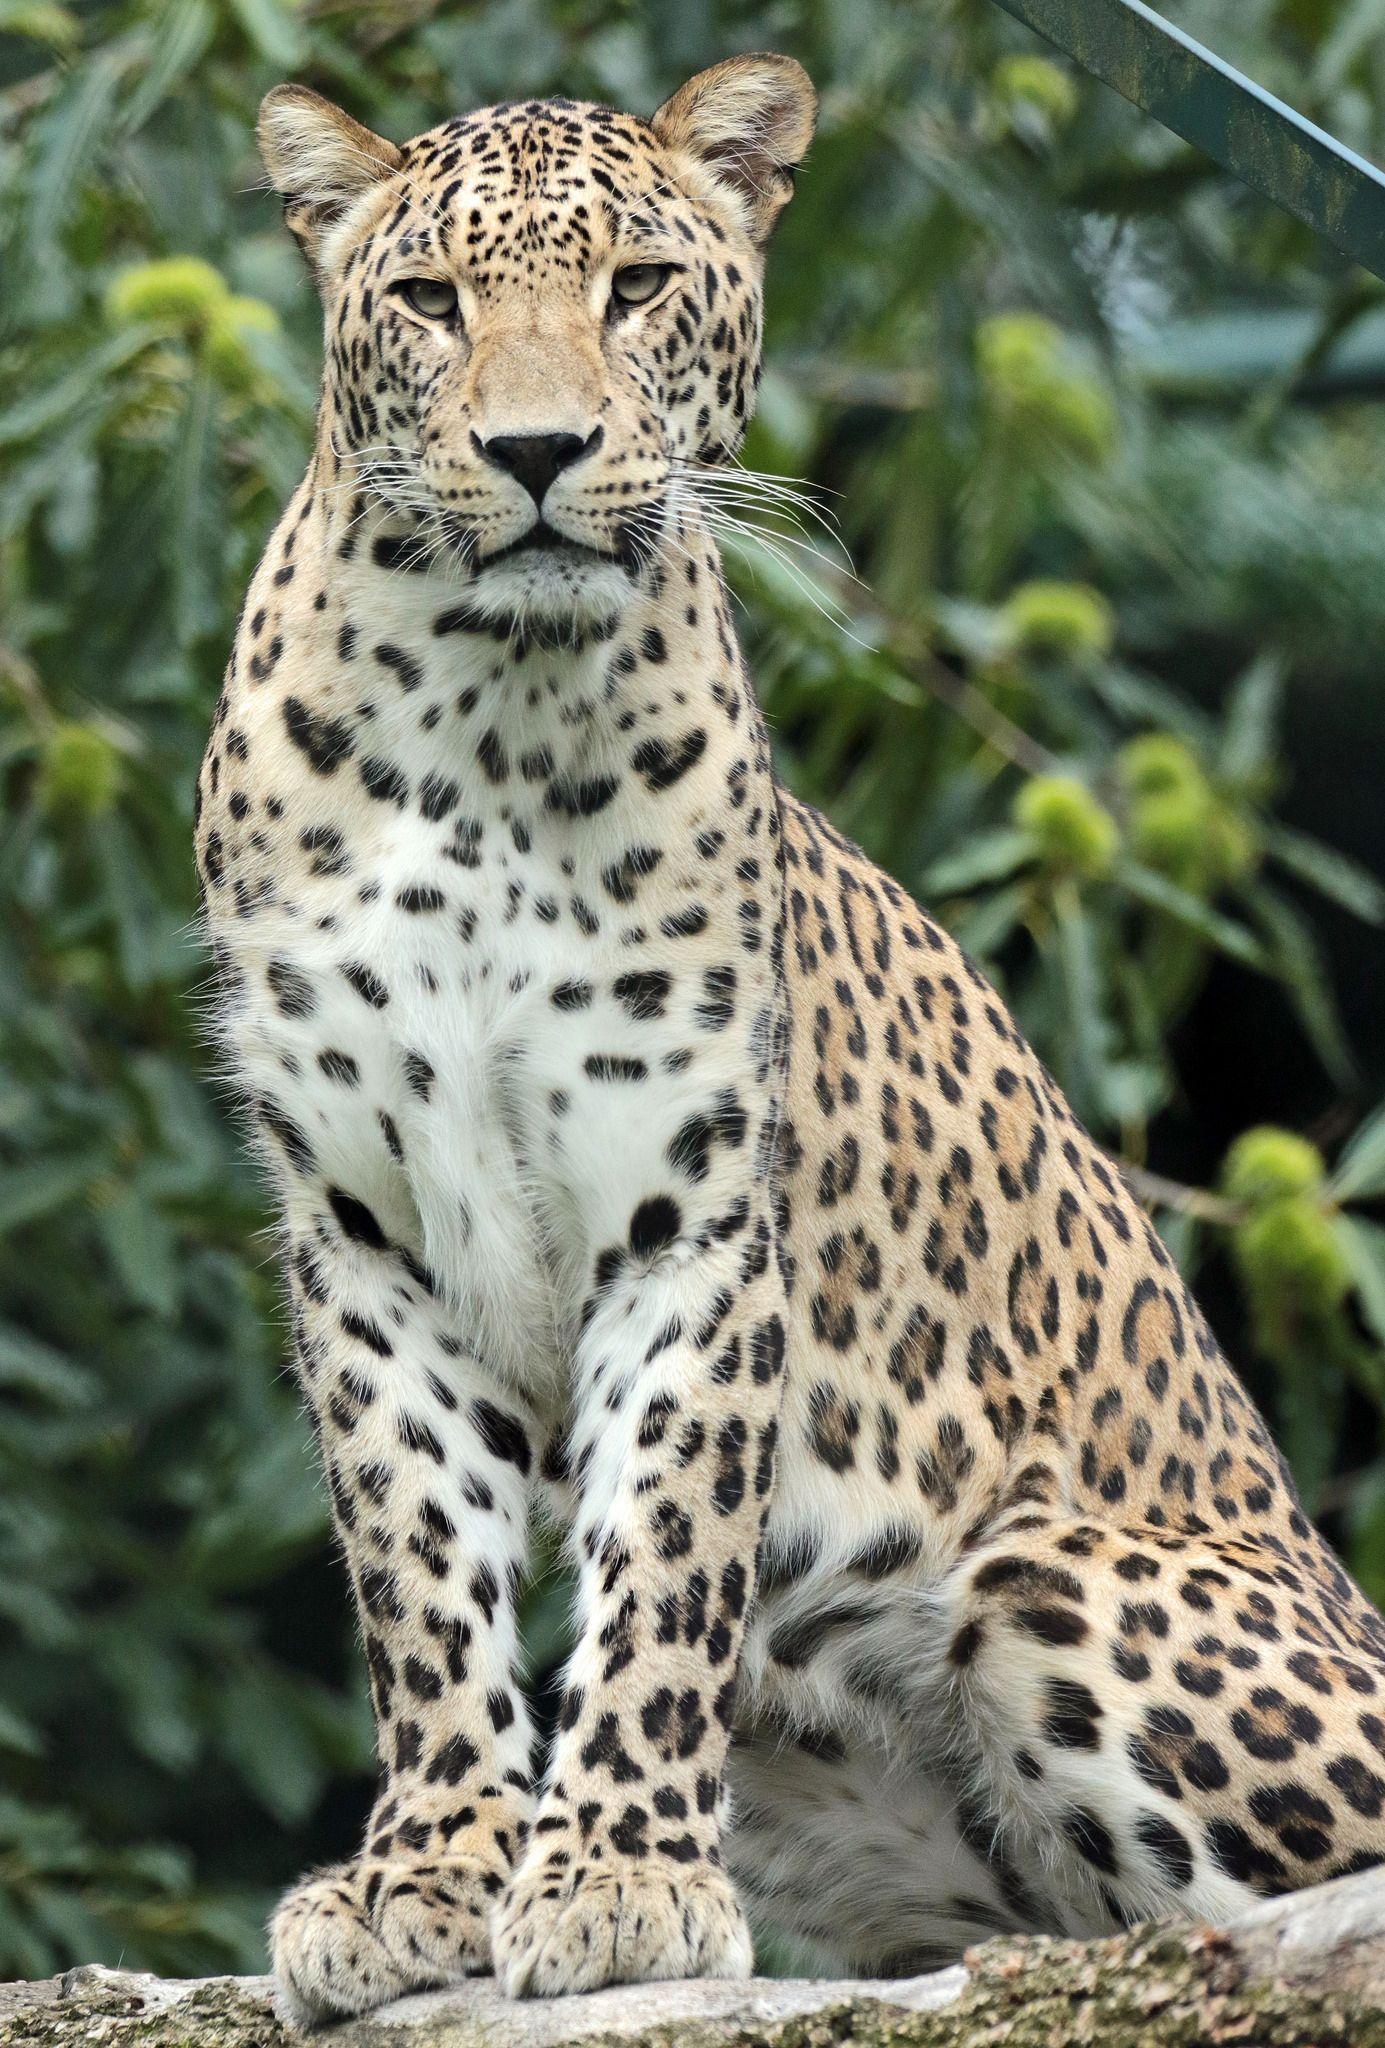 Pin on Felinidae--Leopards